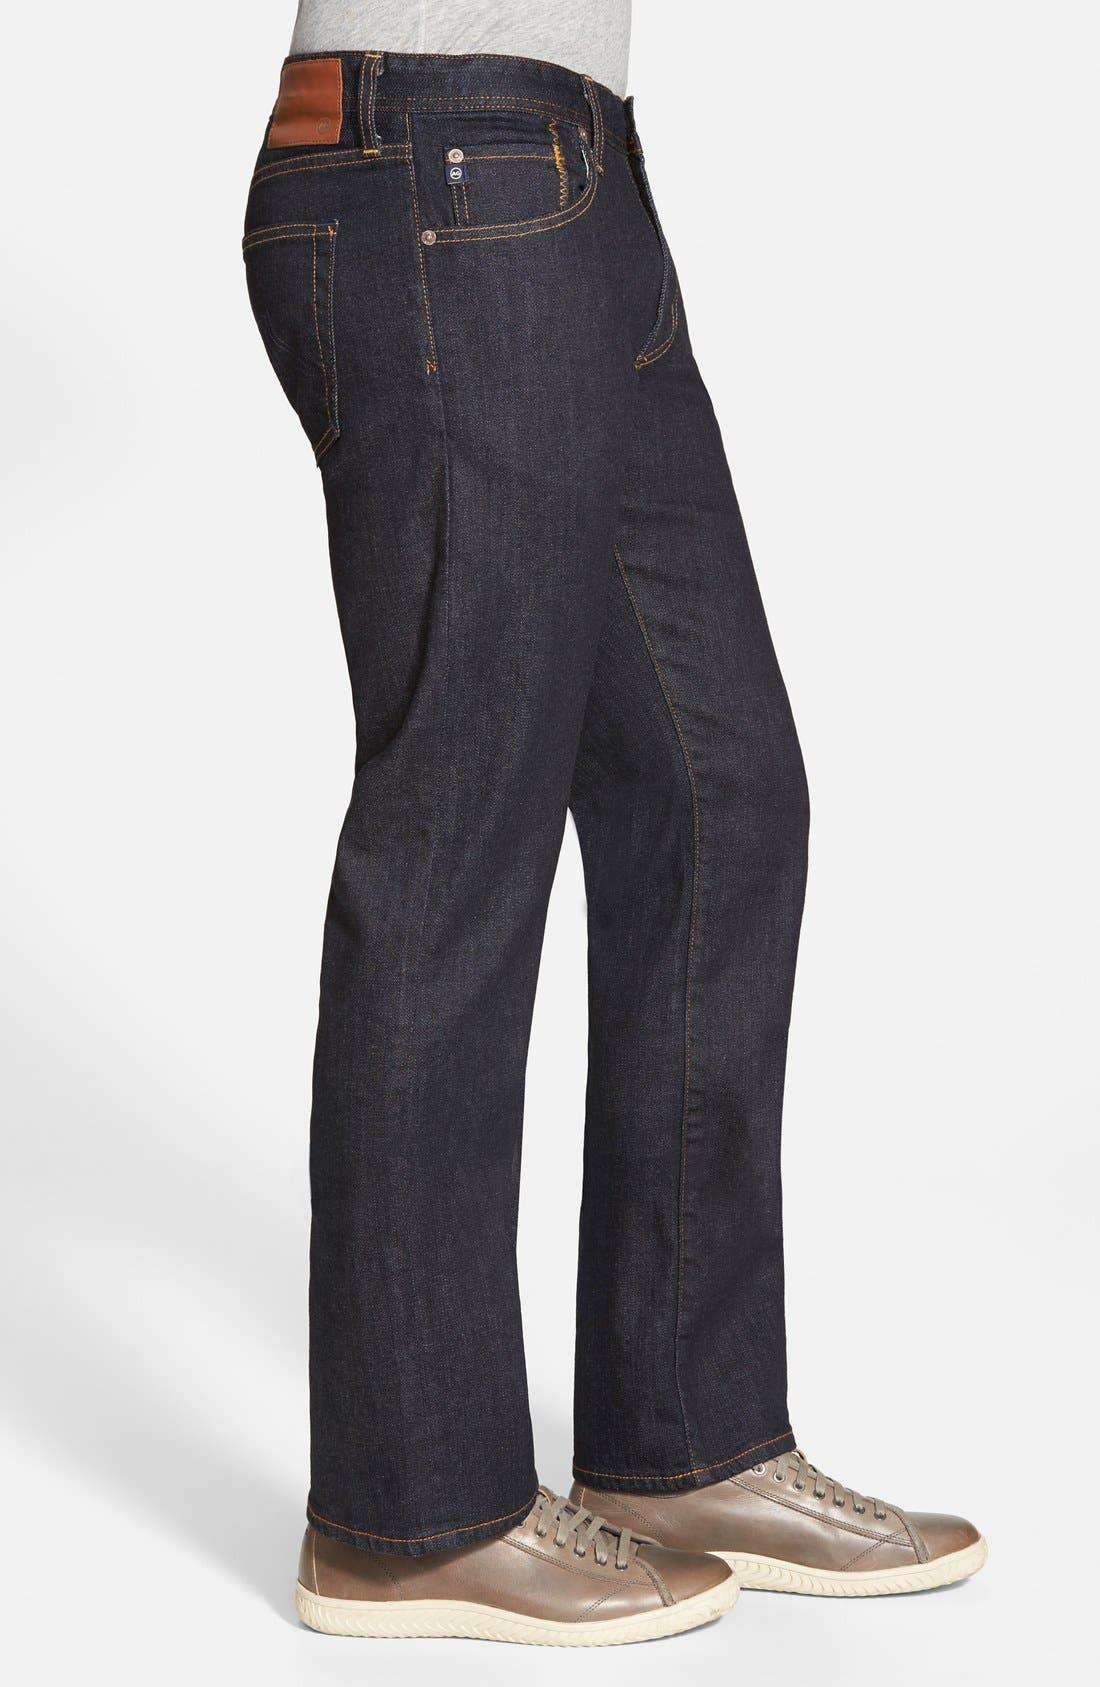 Protégé Straight Leg Jeans,                             Alternate thumbnail 3, color,                             461